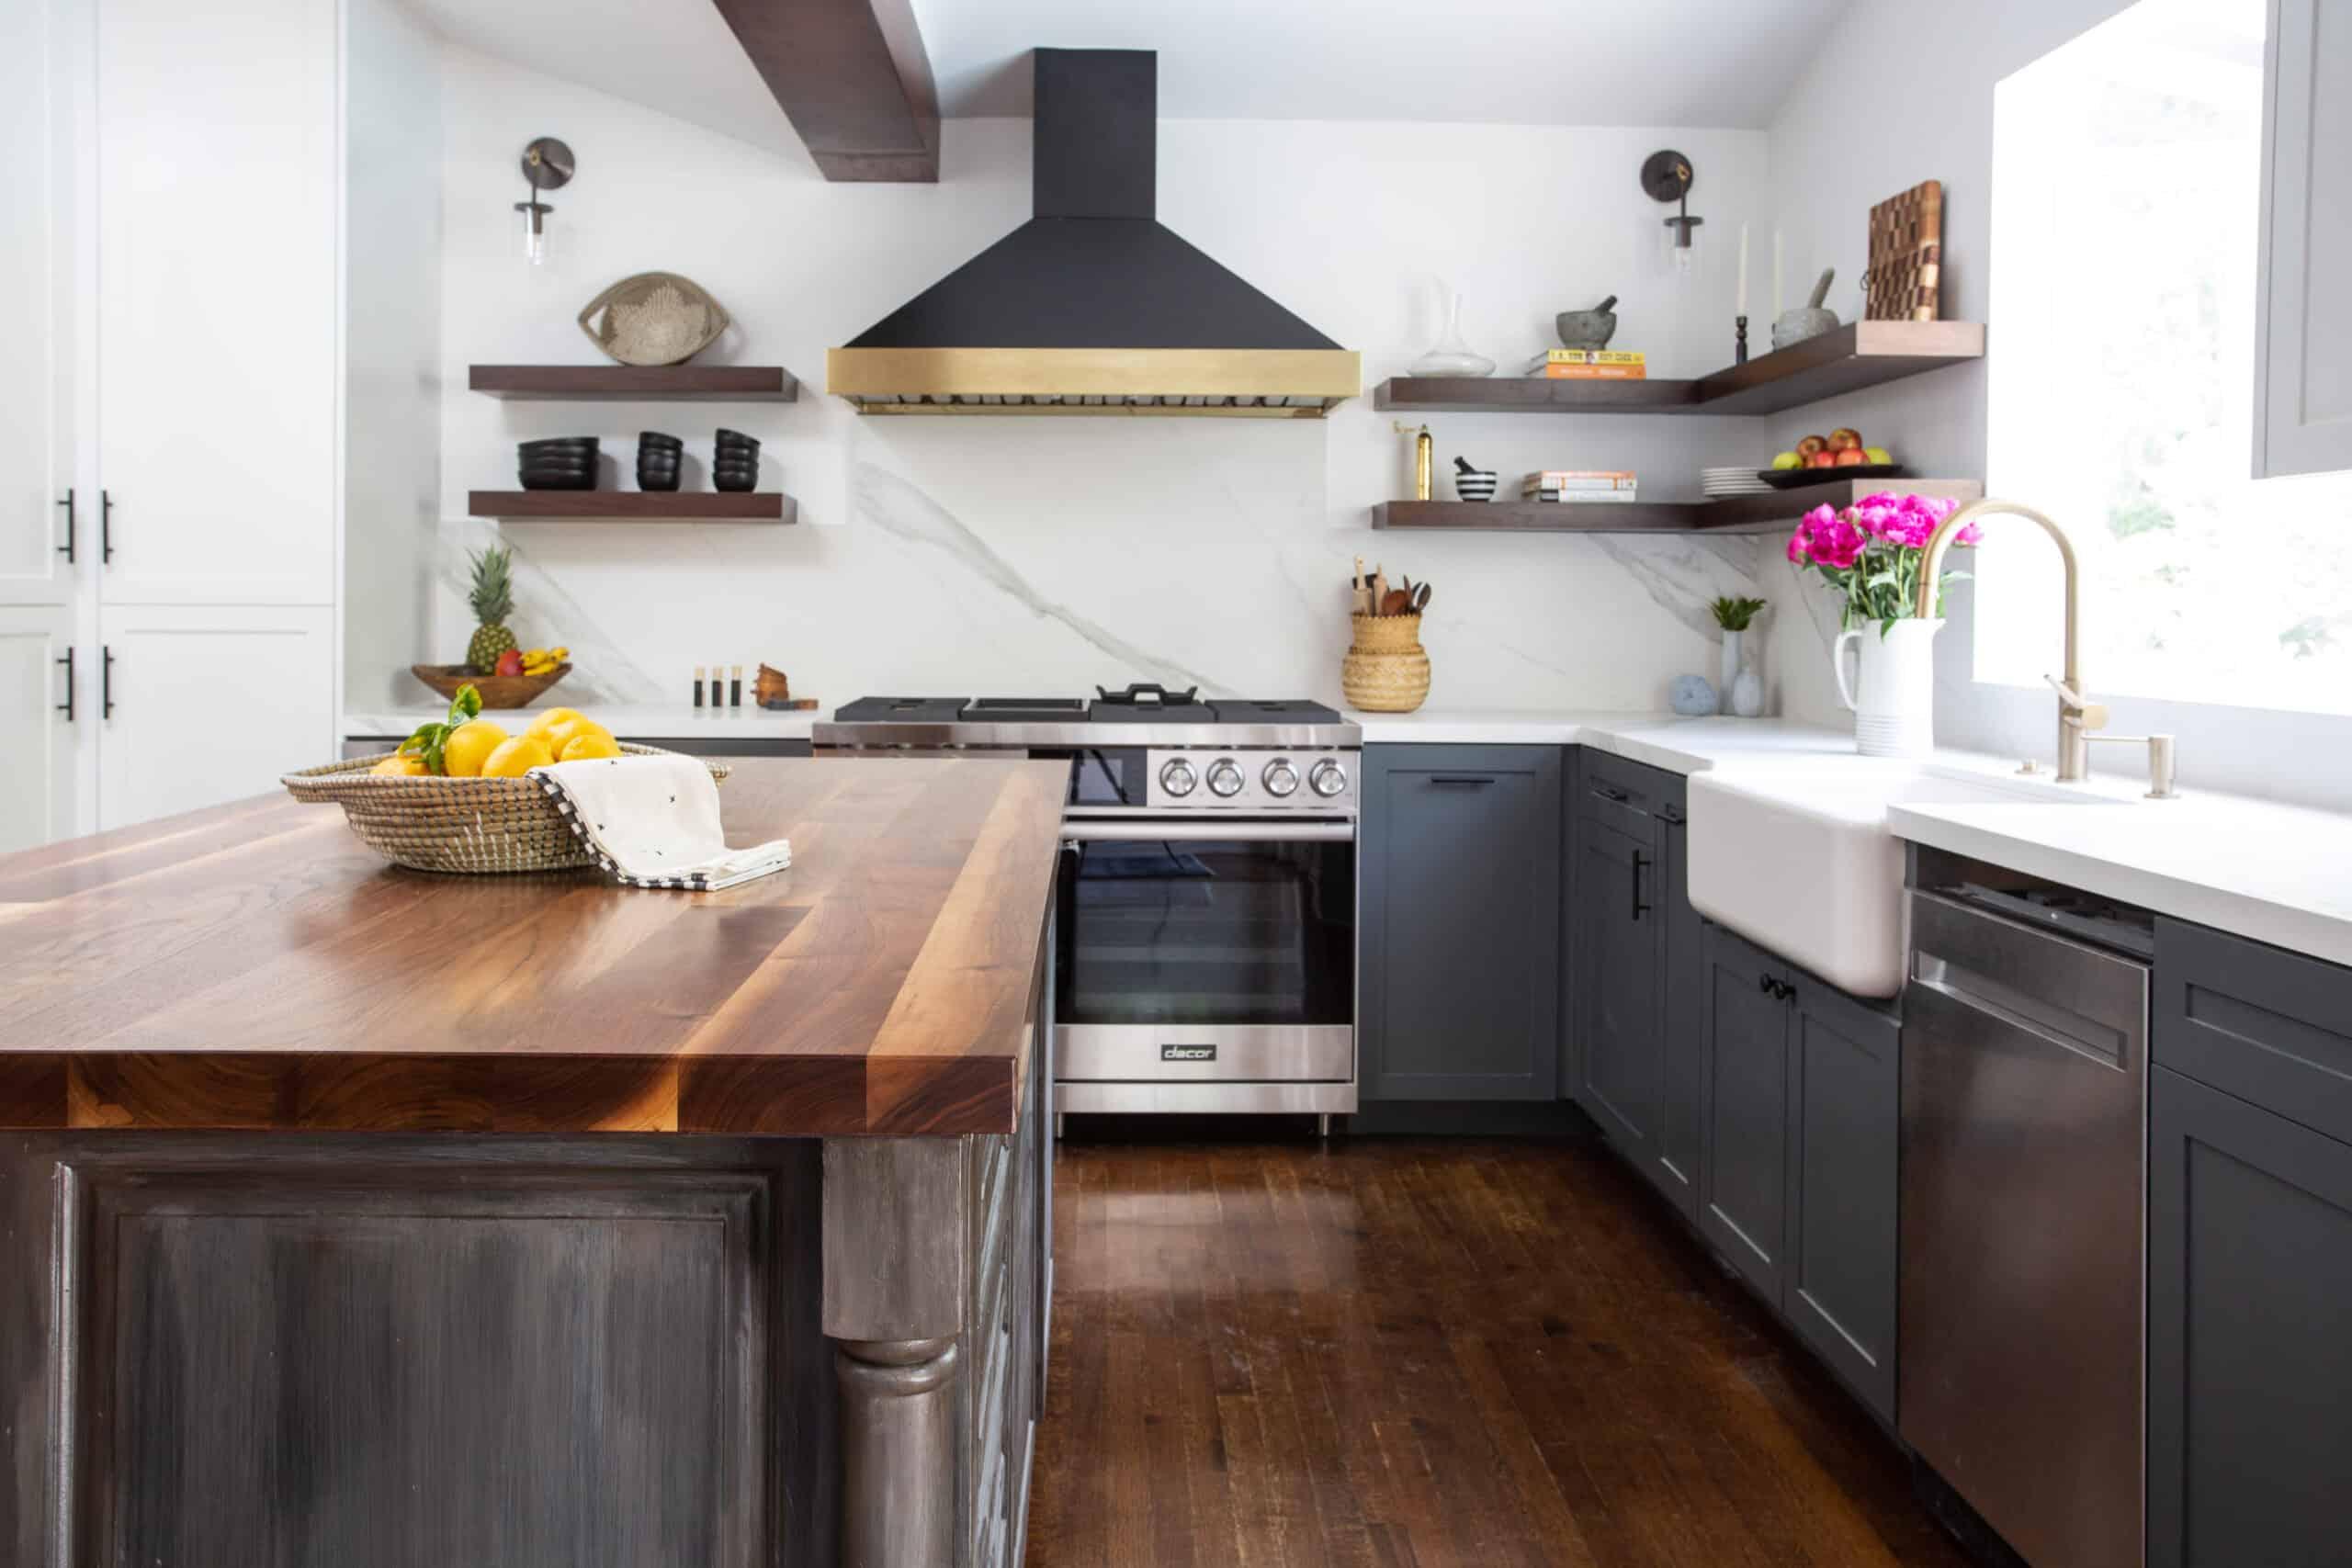 linda grasso's kitchen remodel: an entertainer's dream come true